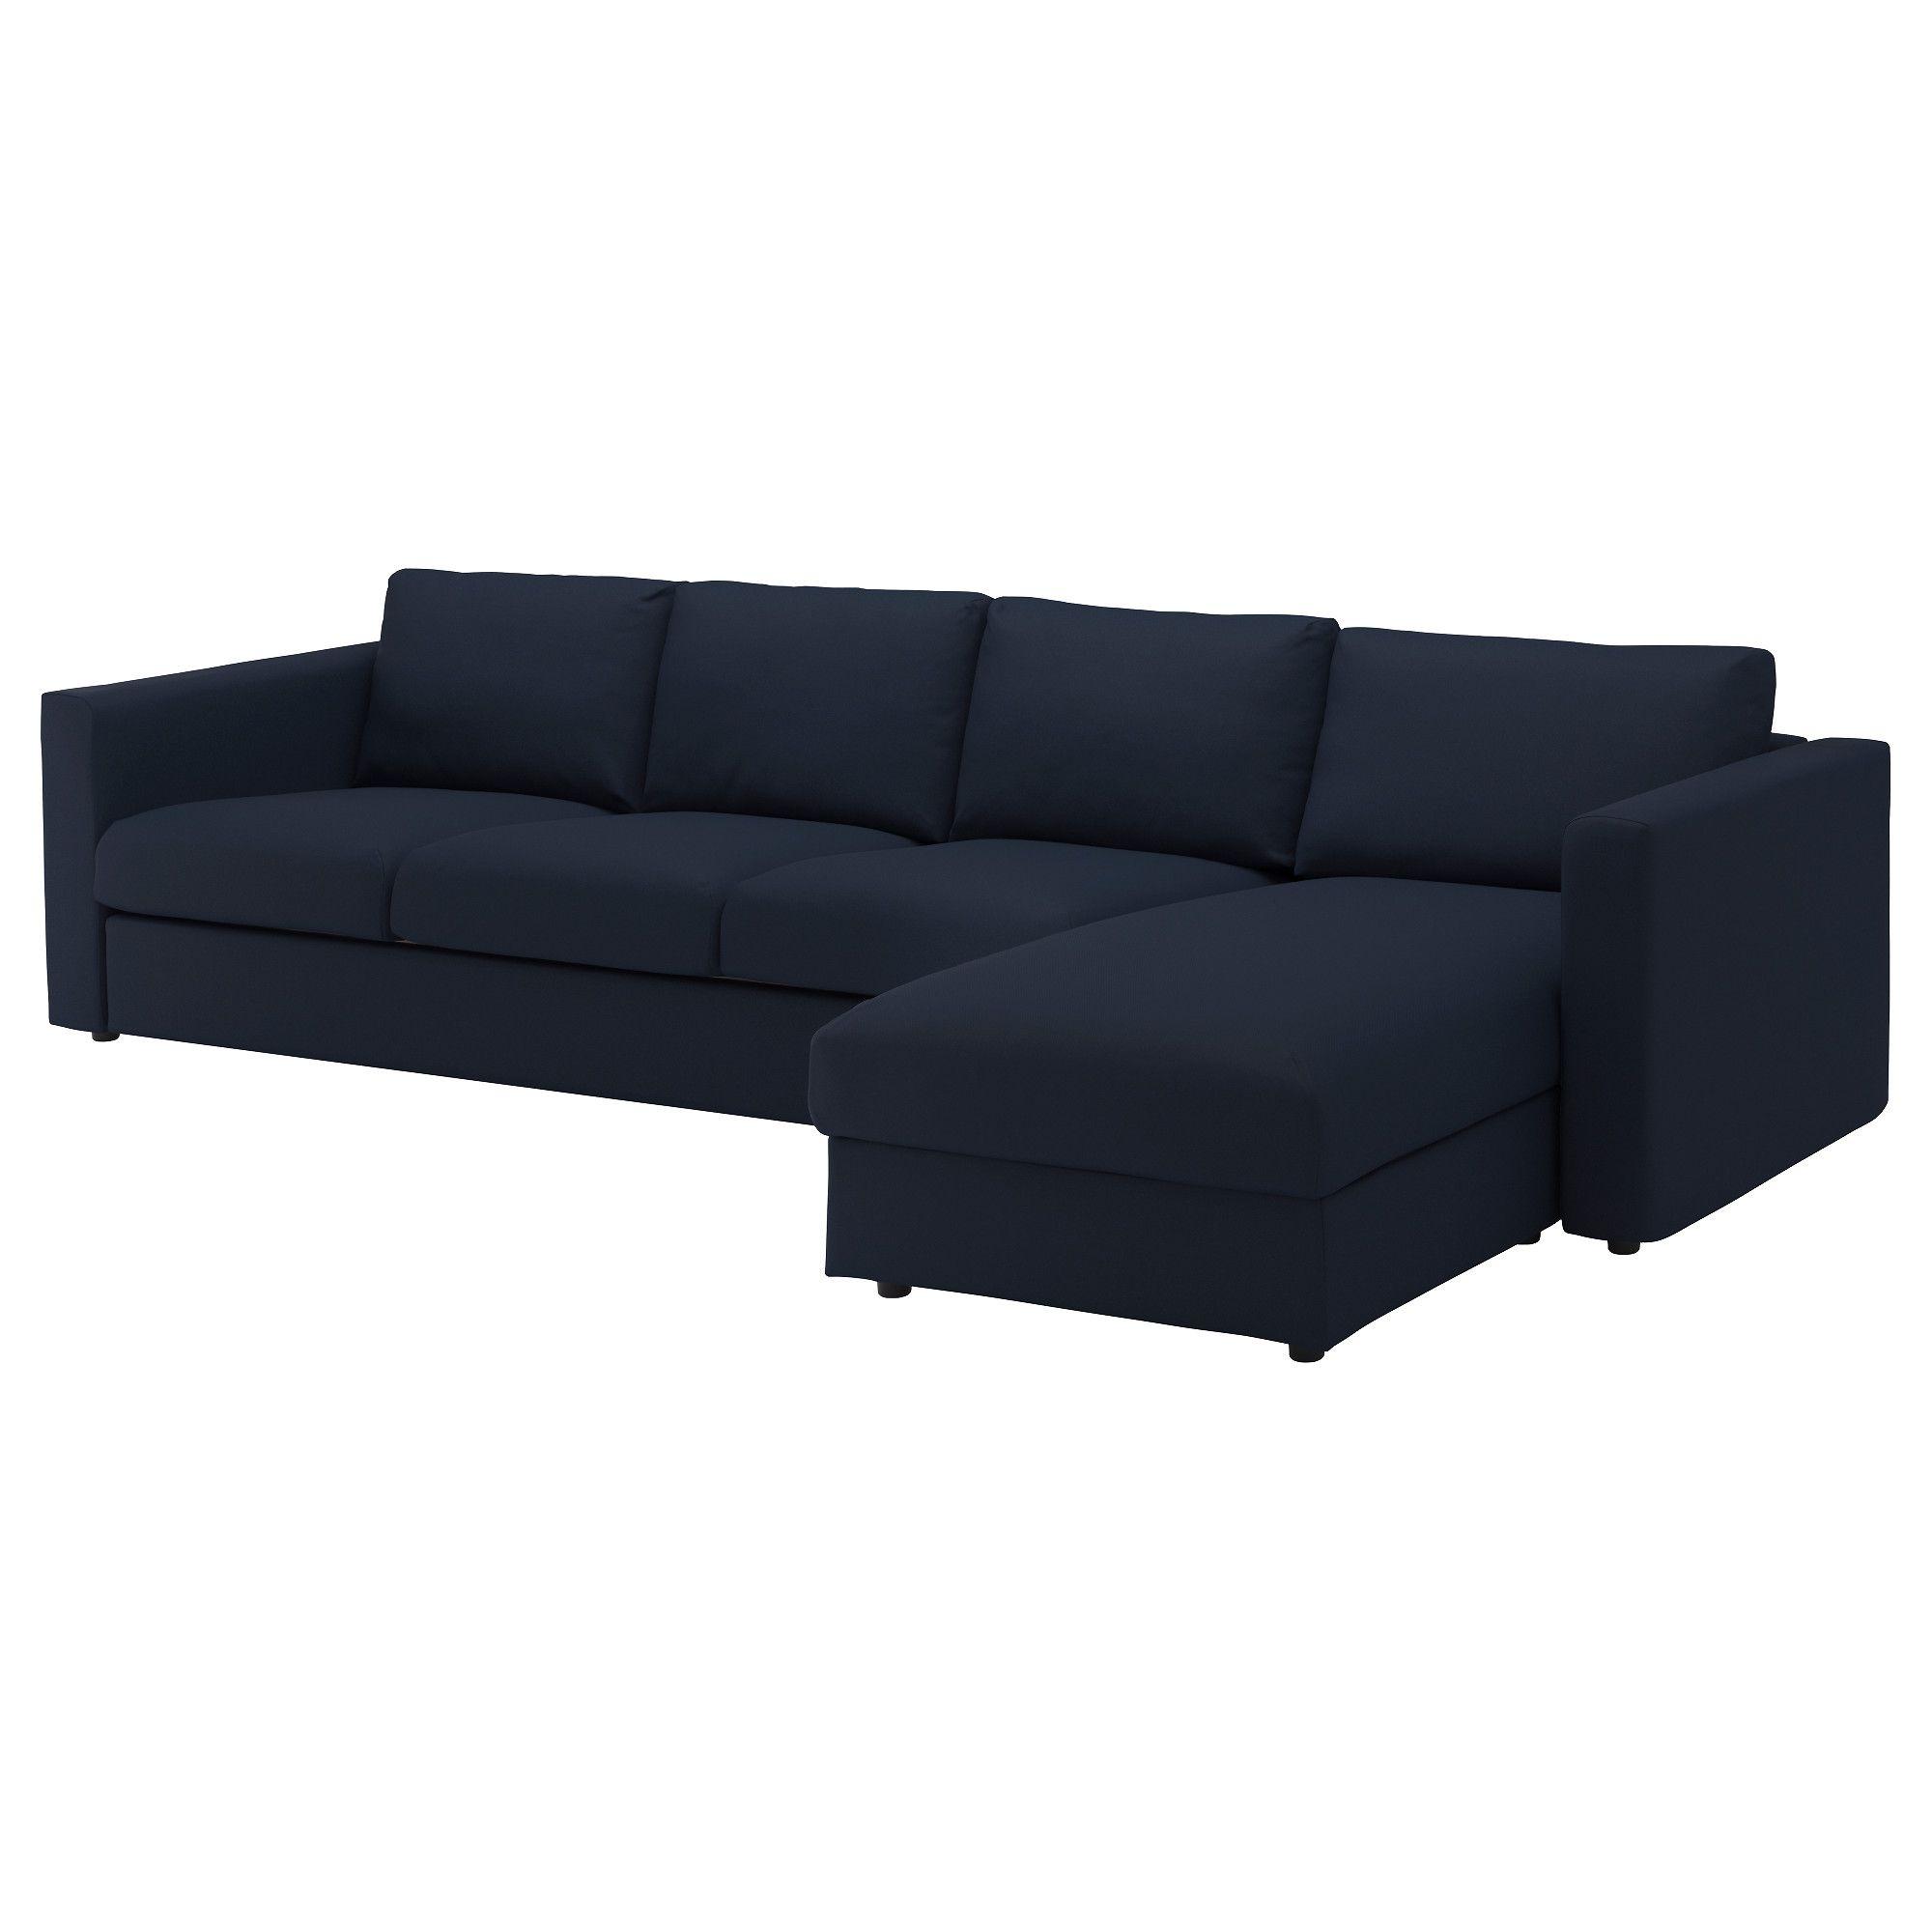 Schlafcouch Blau Jean Sofa Kobalt Blau Sofa Aqua Leder Couch High ...